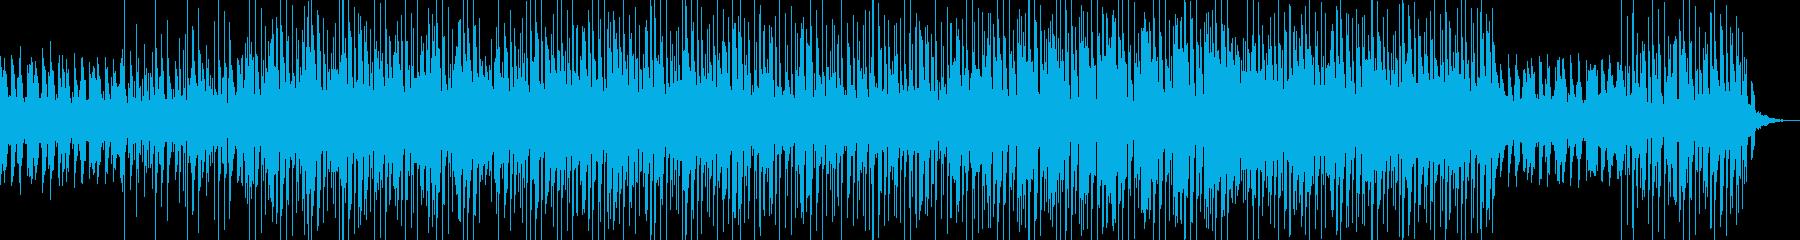 8bit風シンセ音が奏でる切ないメロディの再生済みの波形